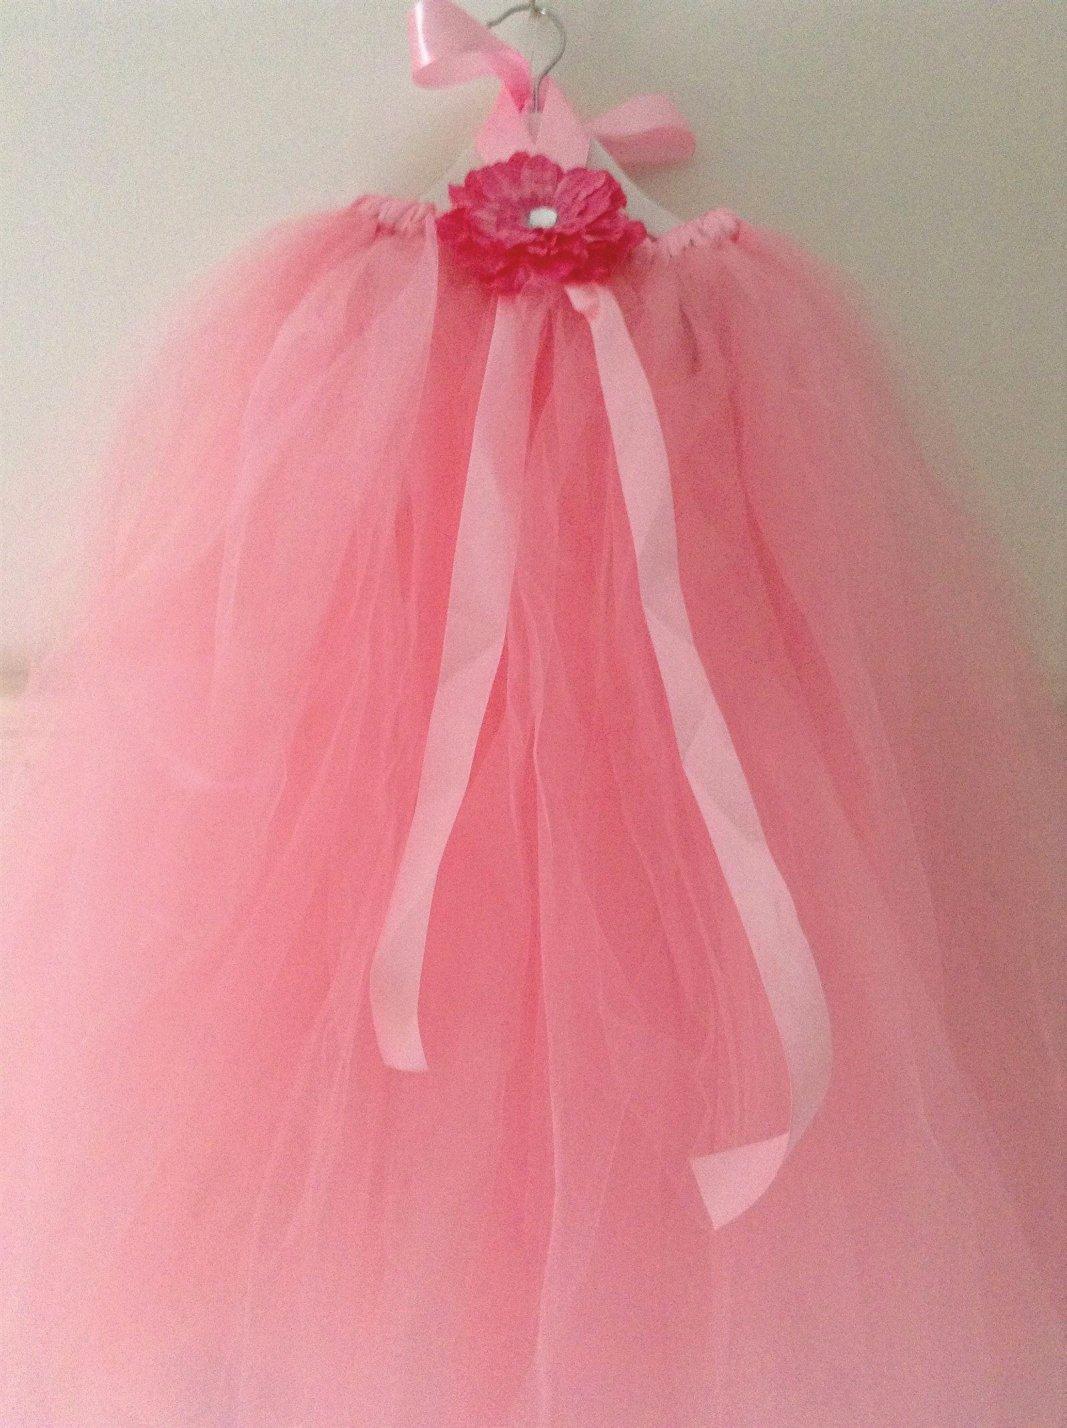 Pink multiway dress-skirt tutu